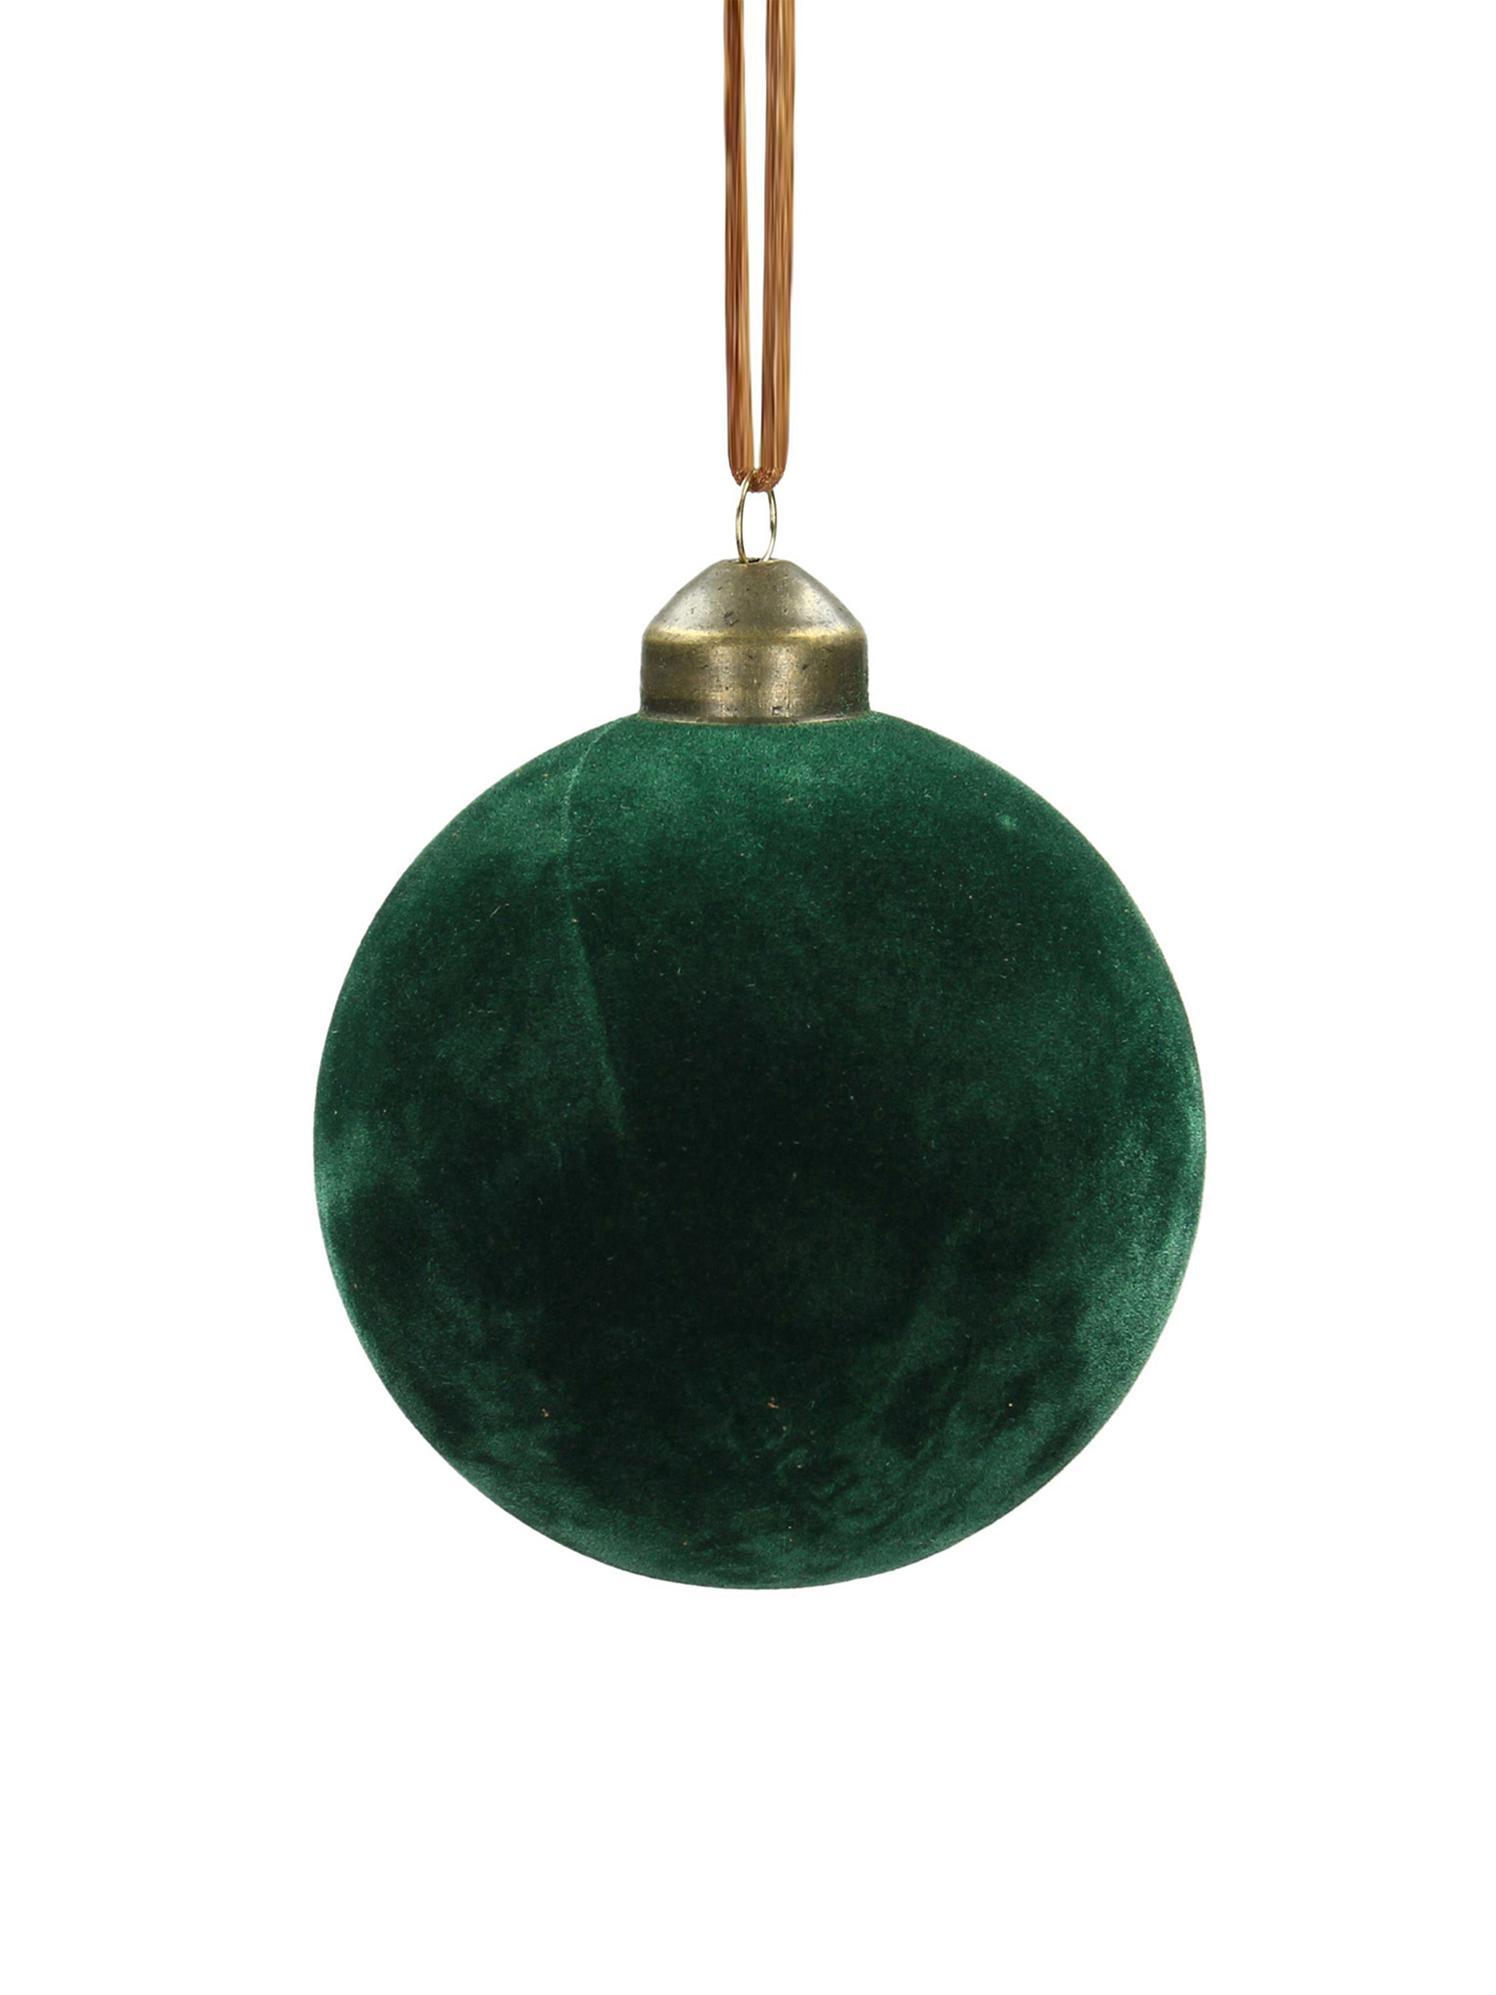 Palla di Natale Velvet Ø 8 cm, 4 pz, Vetro, velluto di poliestere, Verde abete, Ø 8 cm